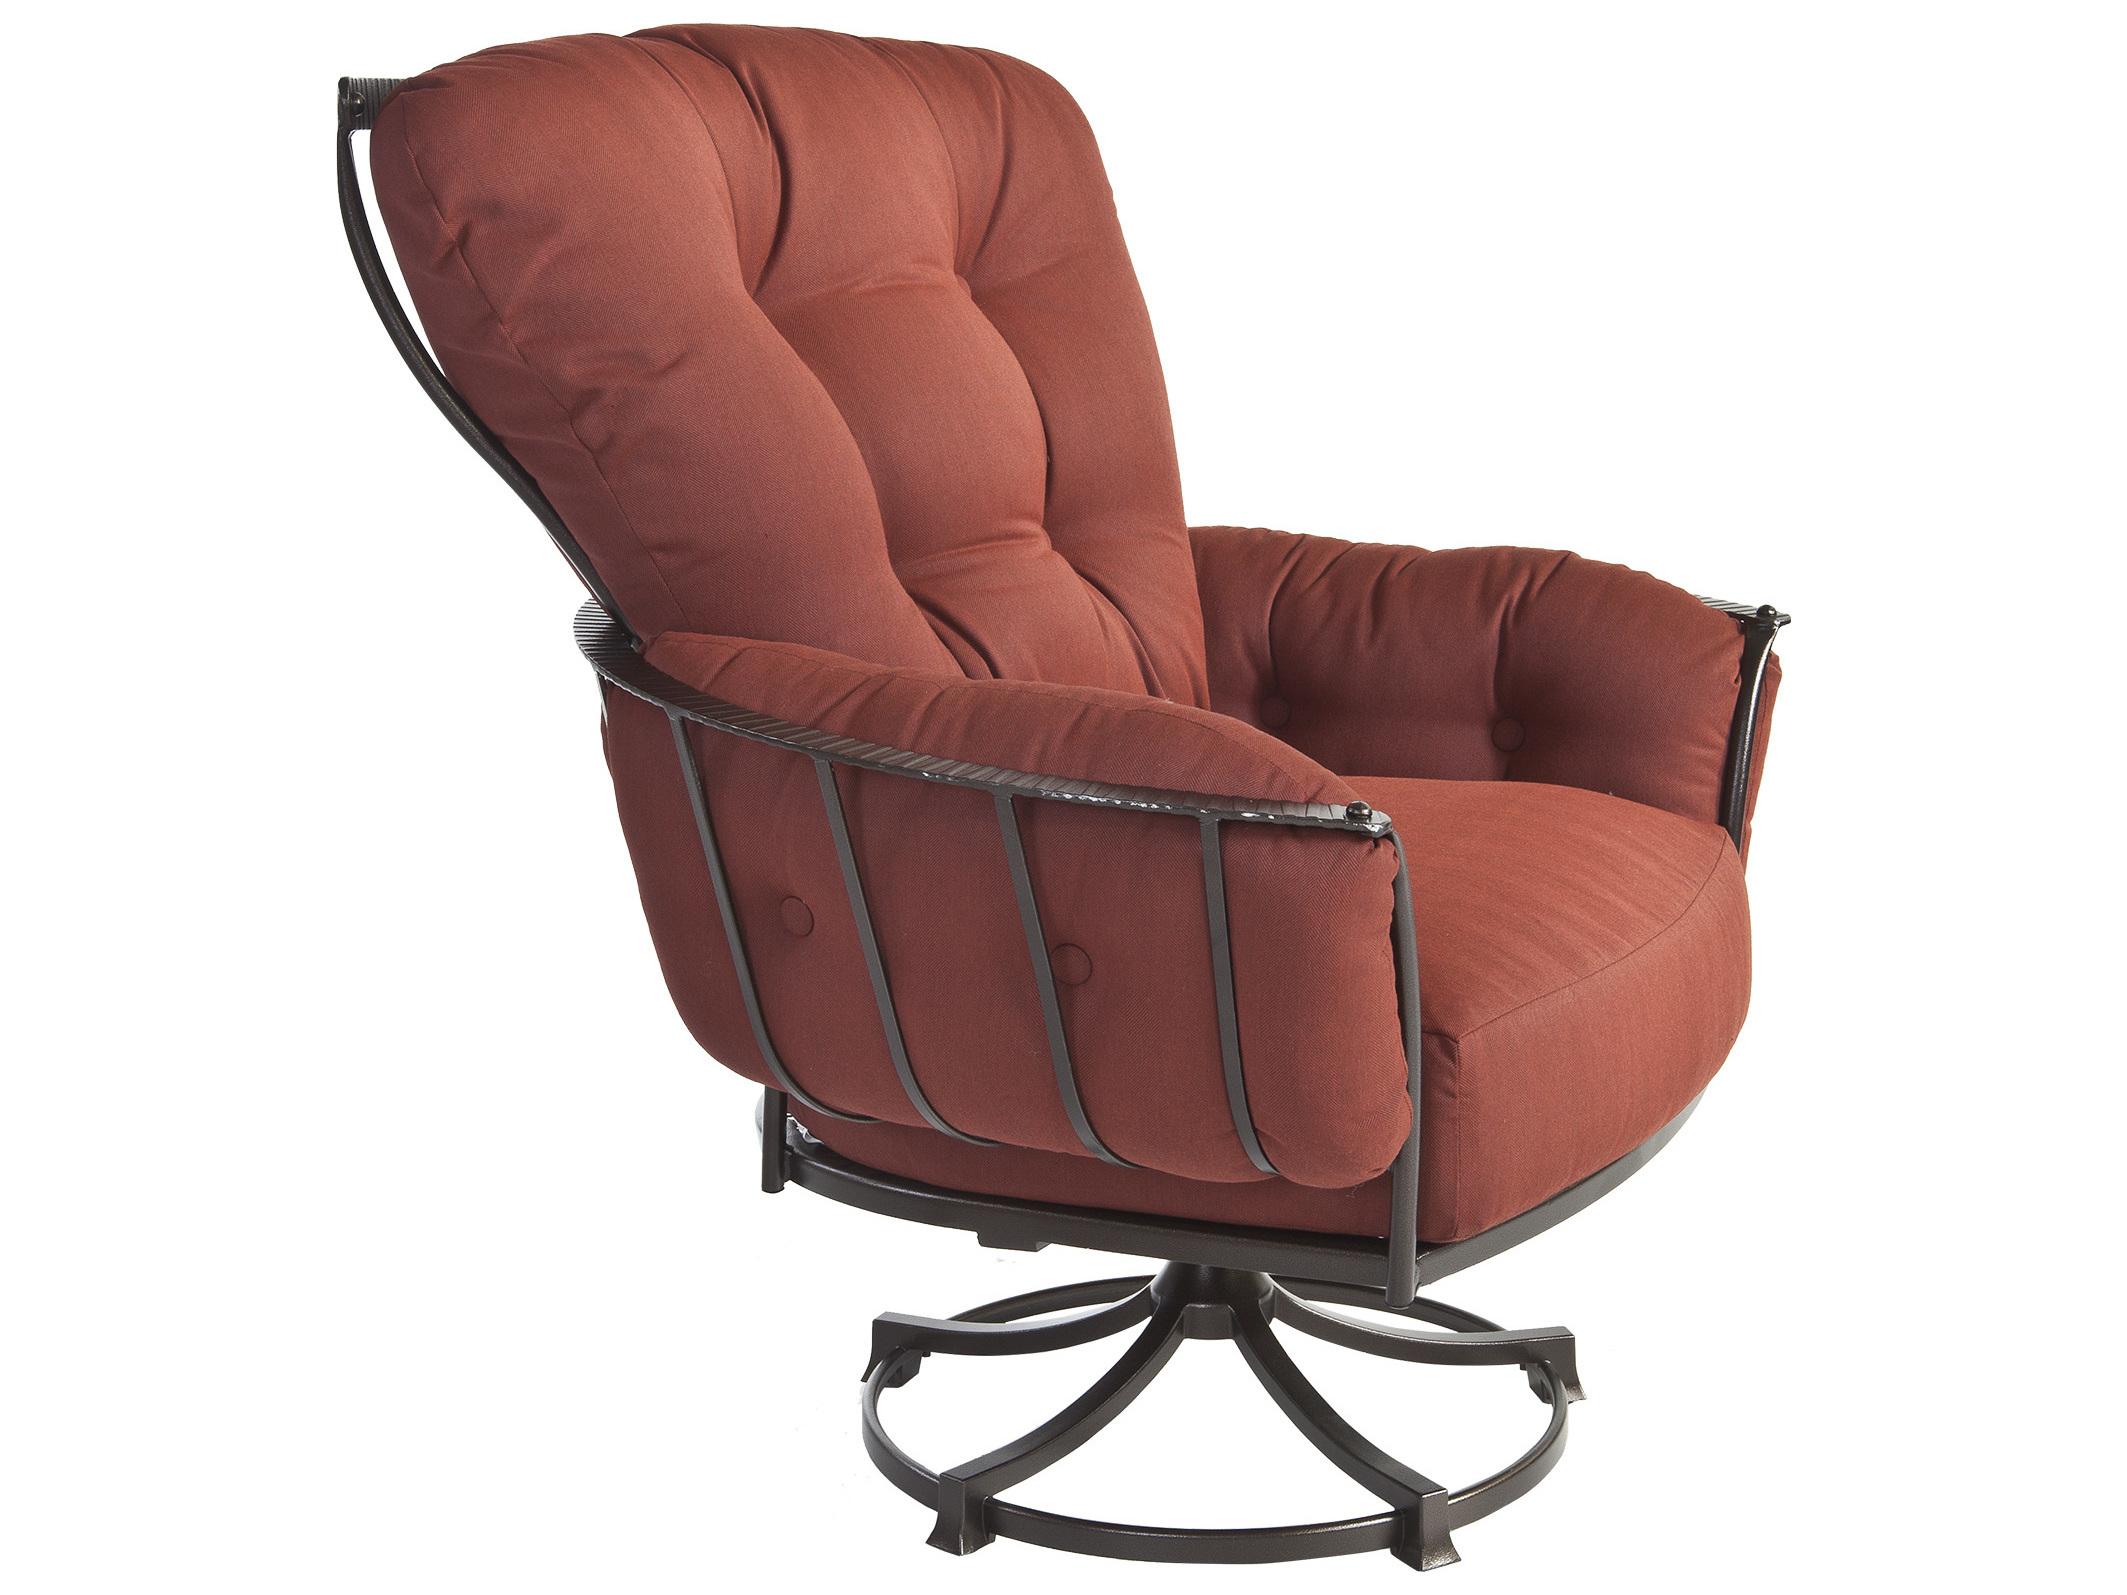 Ow Lee Quick Ship Wrought Iron Swivel Rocker Lounge Chair